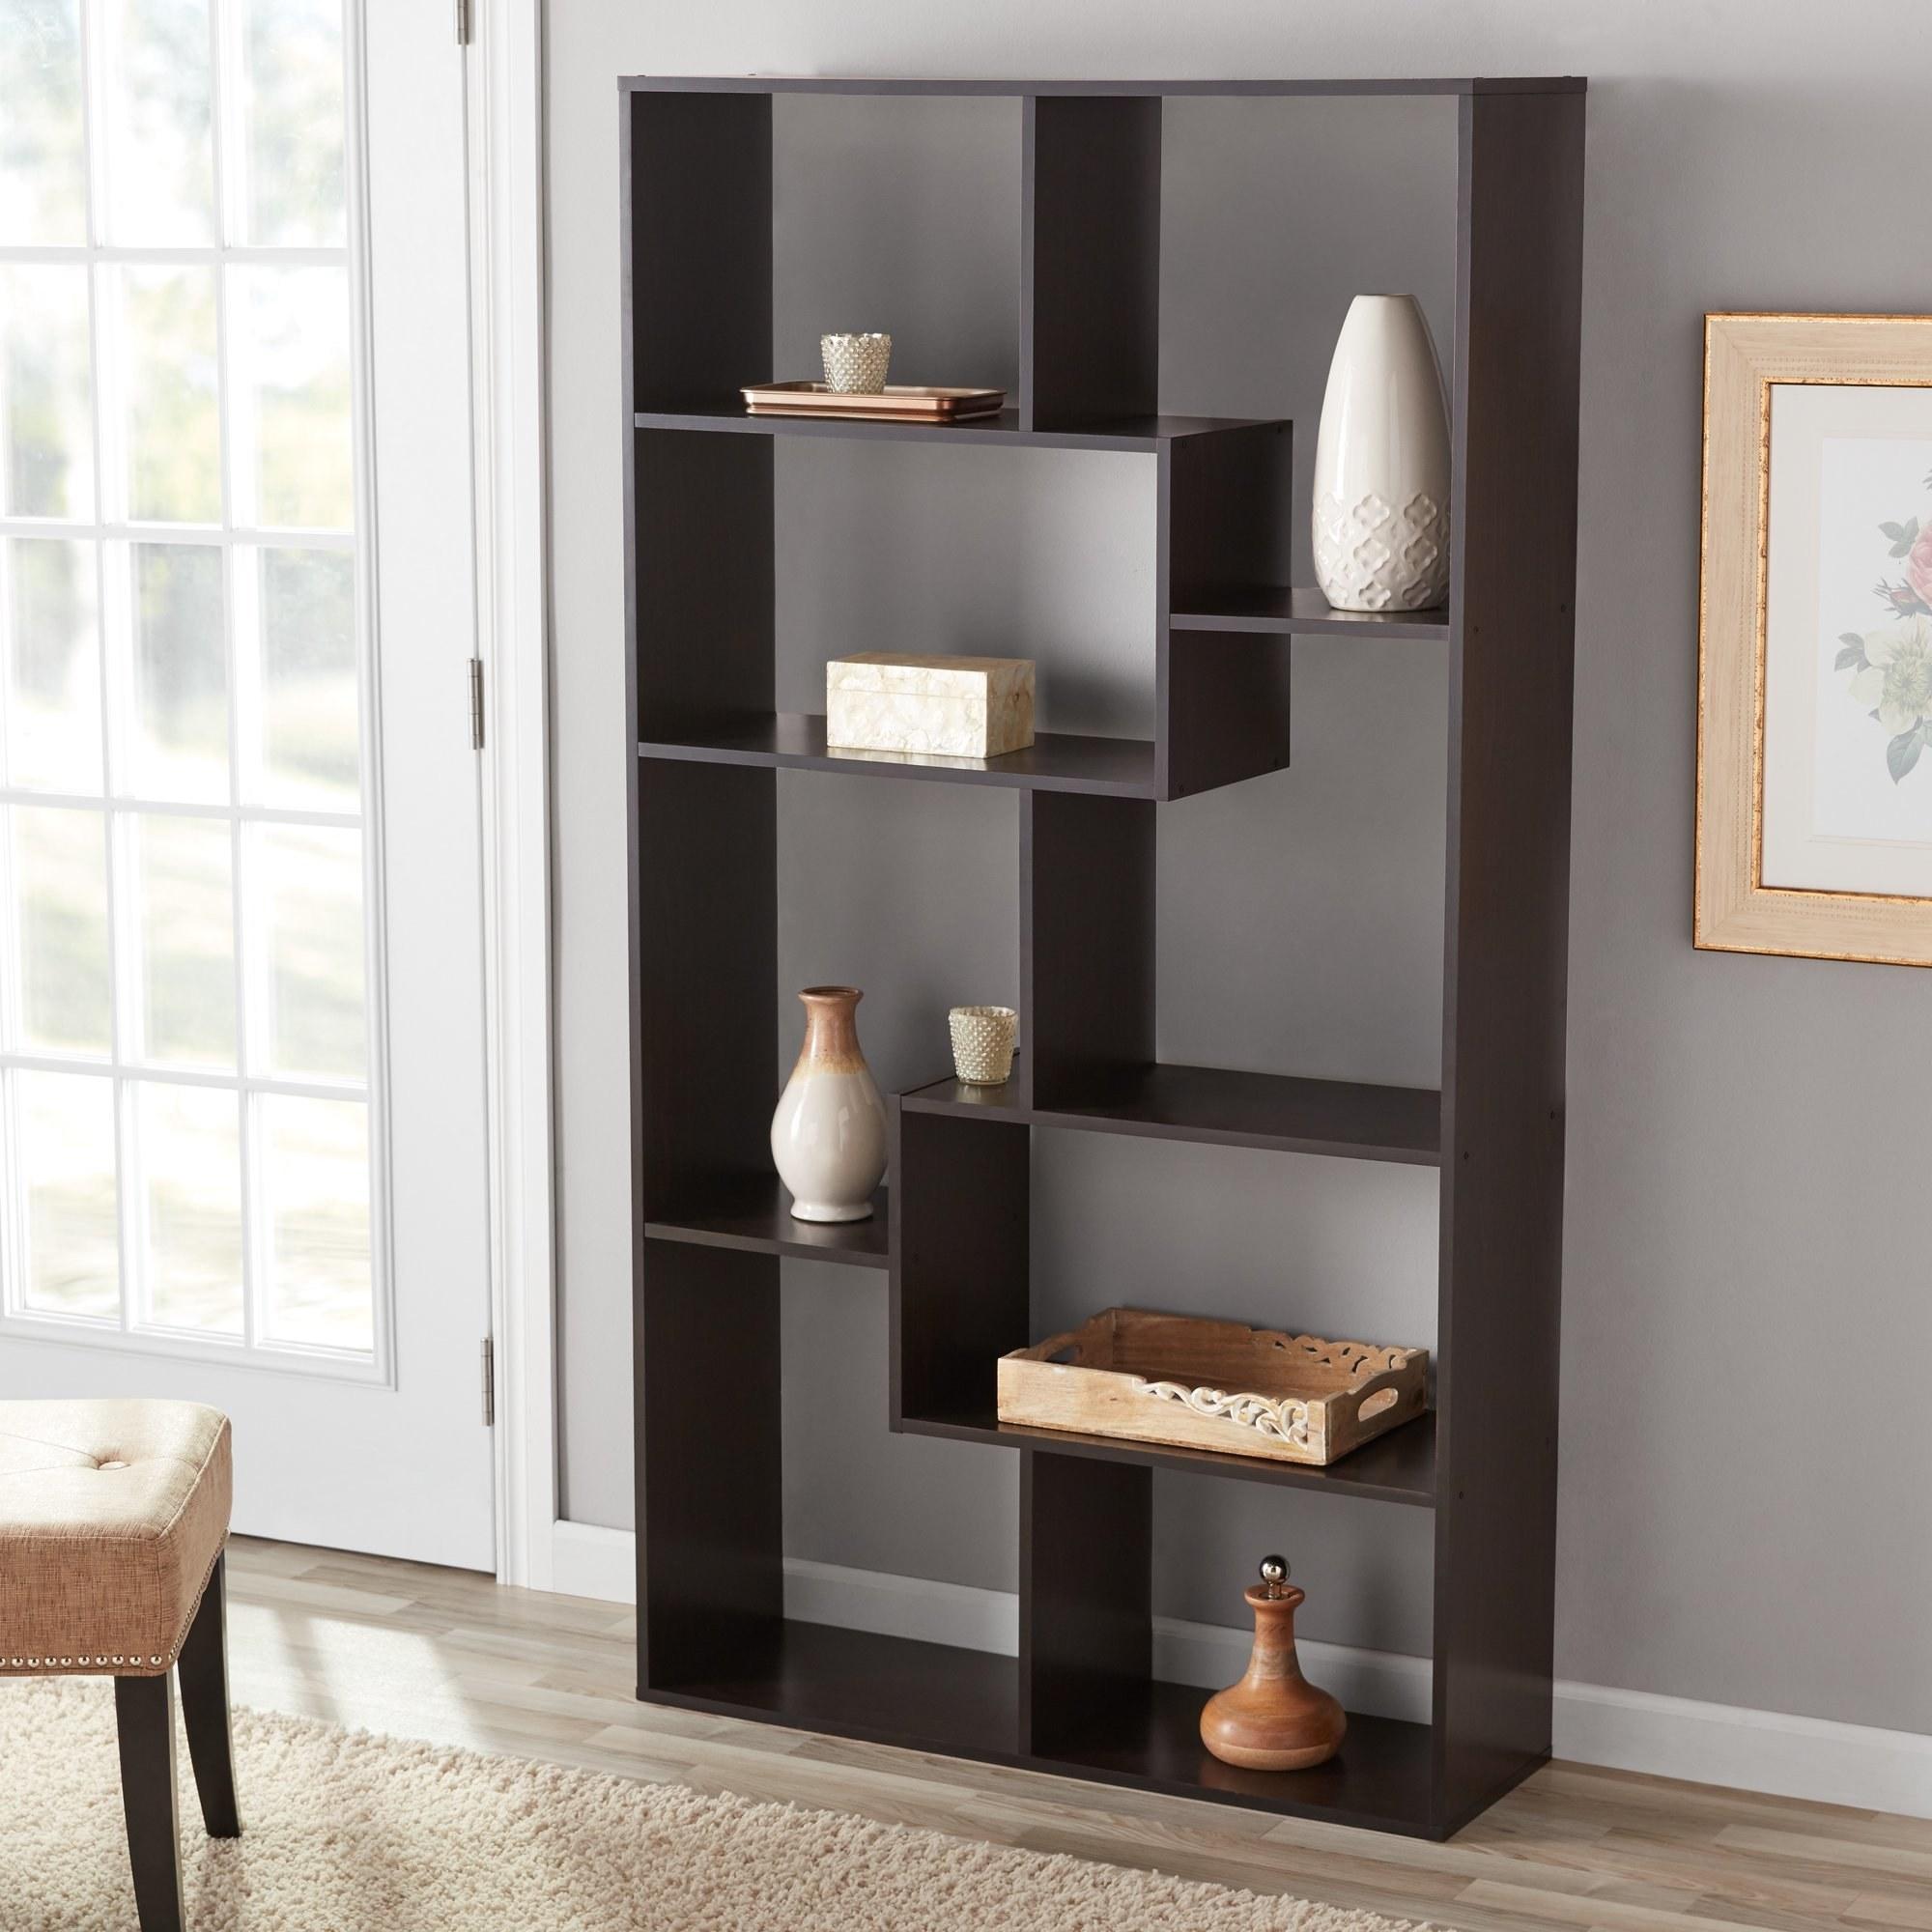 Bookshelf with items on it